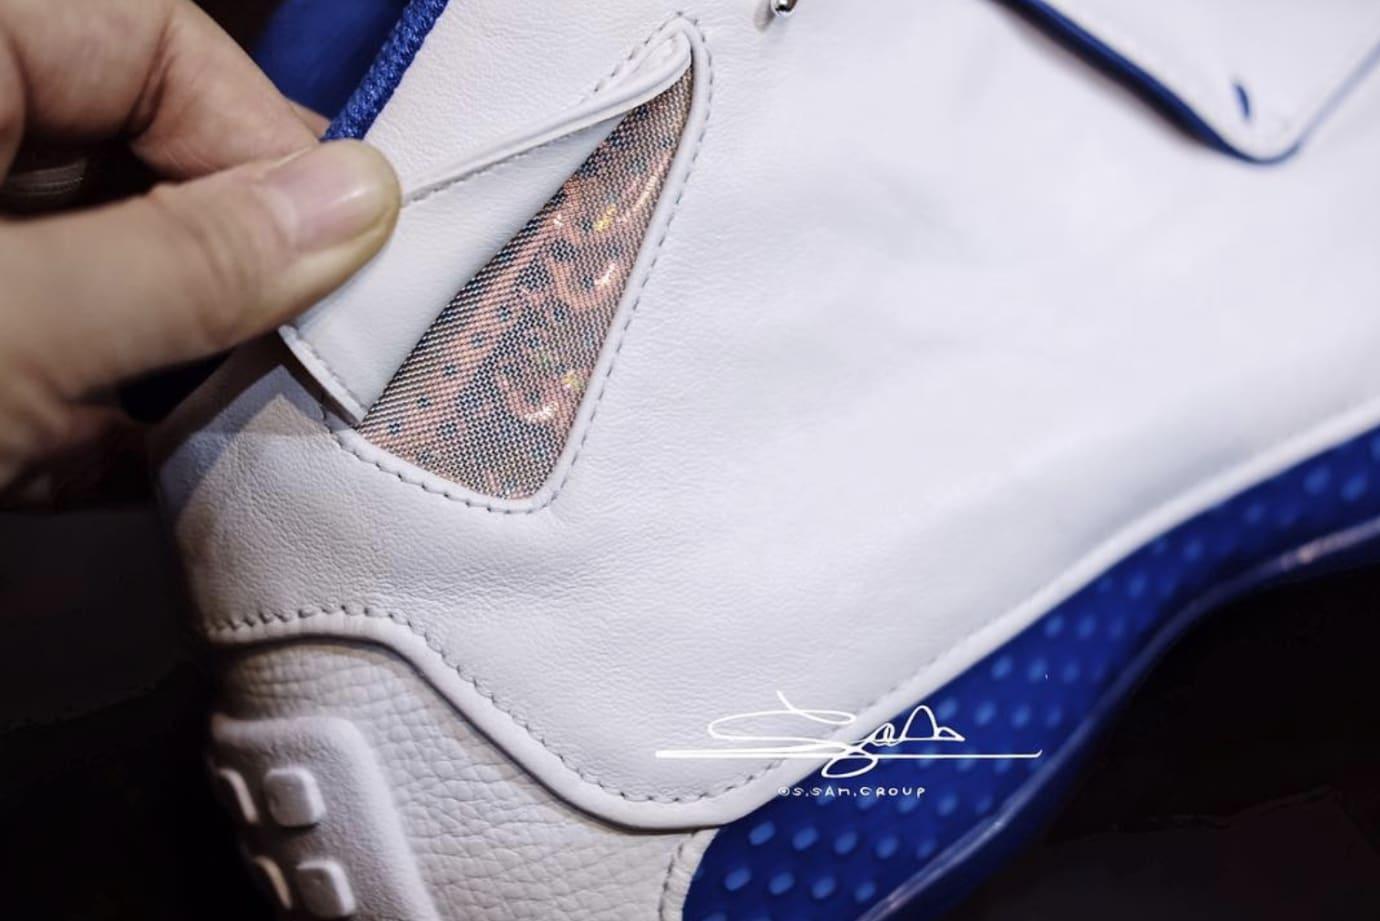 Air Jordan 18 White/Sport Royal-White-Metallic Silver AA2494-106 (Detail 3)